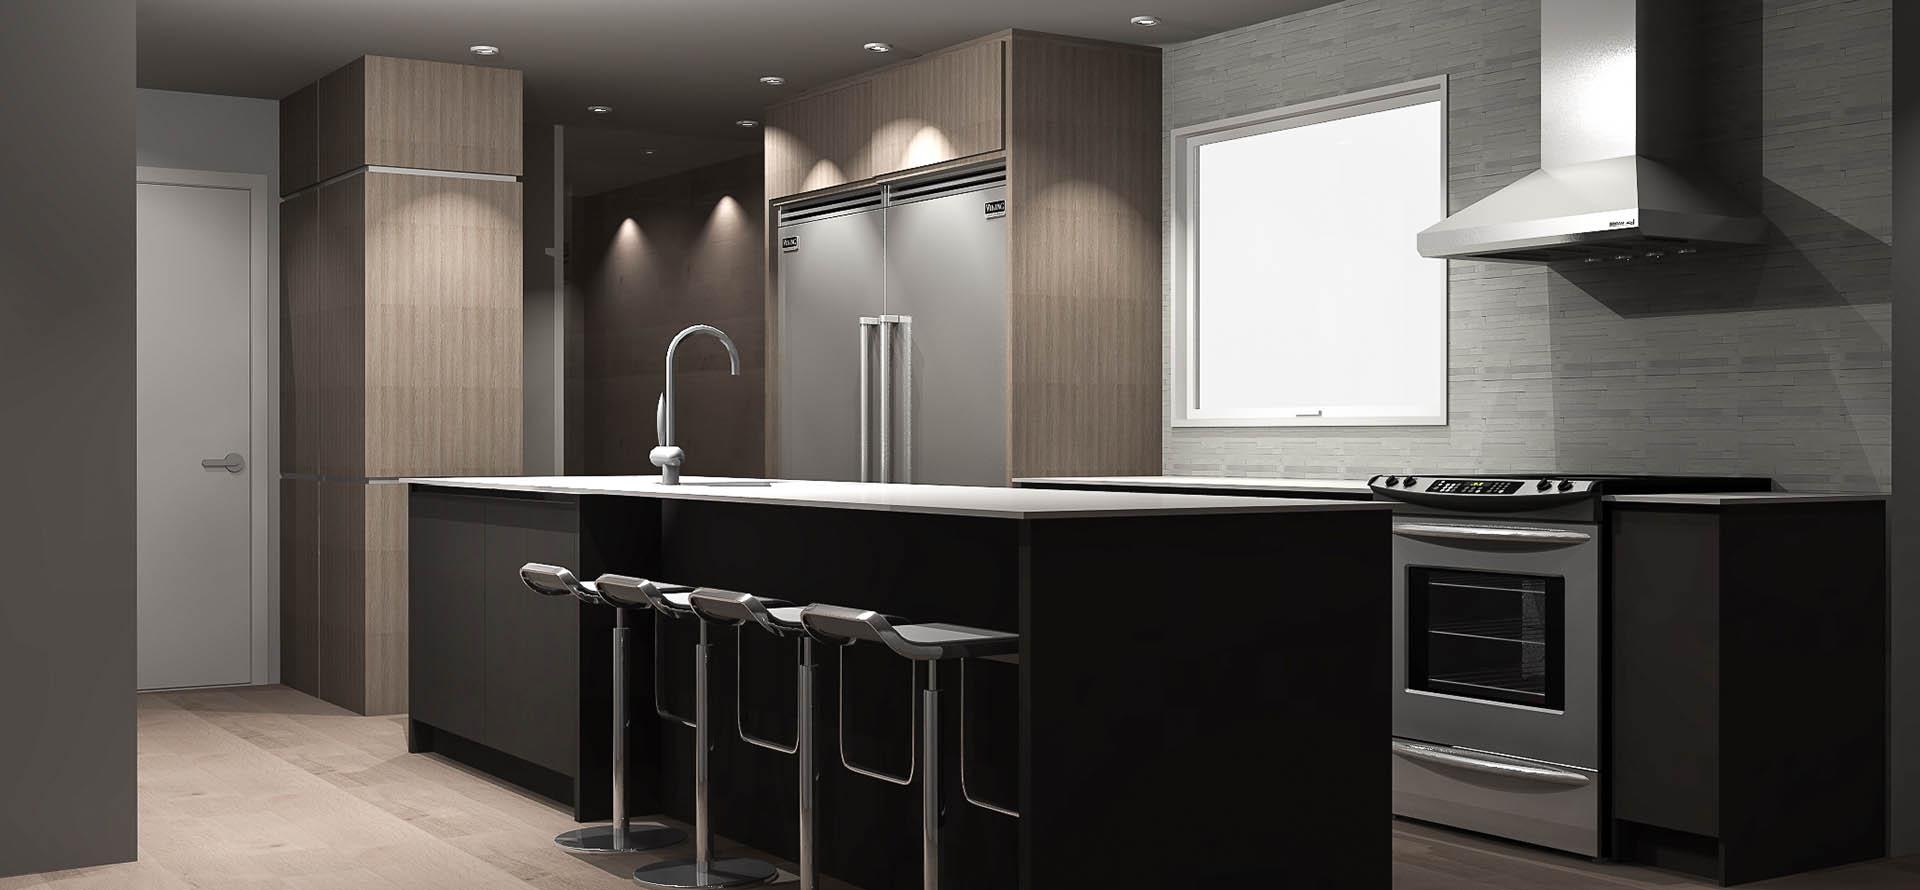 Cuisine Moderne Design portfolio - cuisine moderne